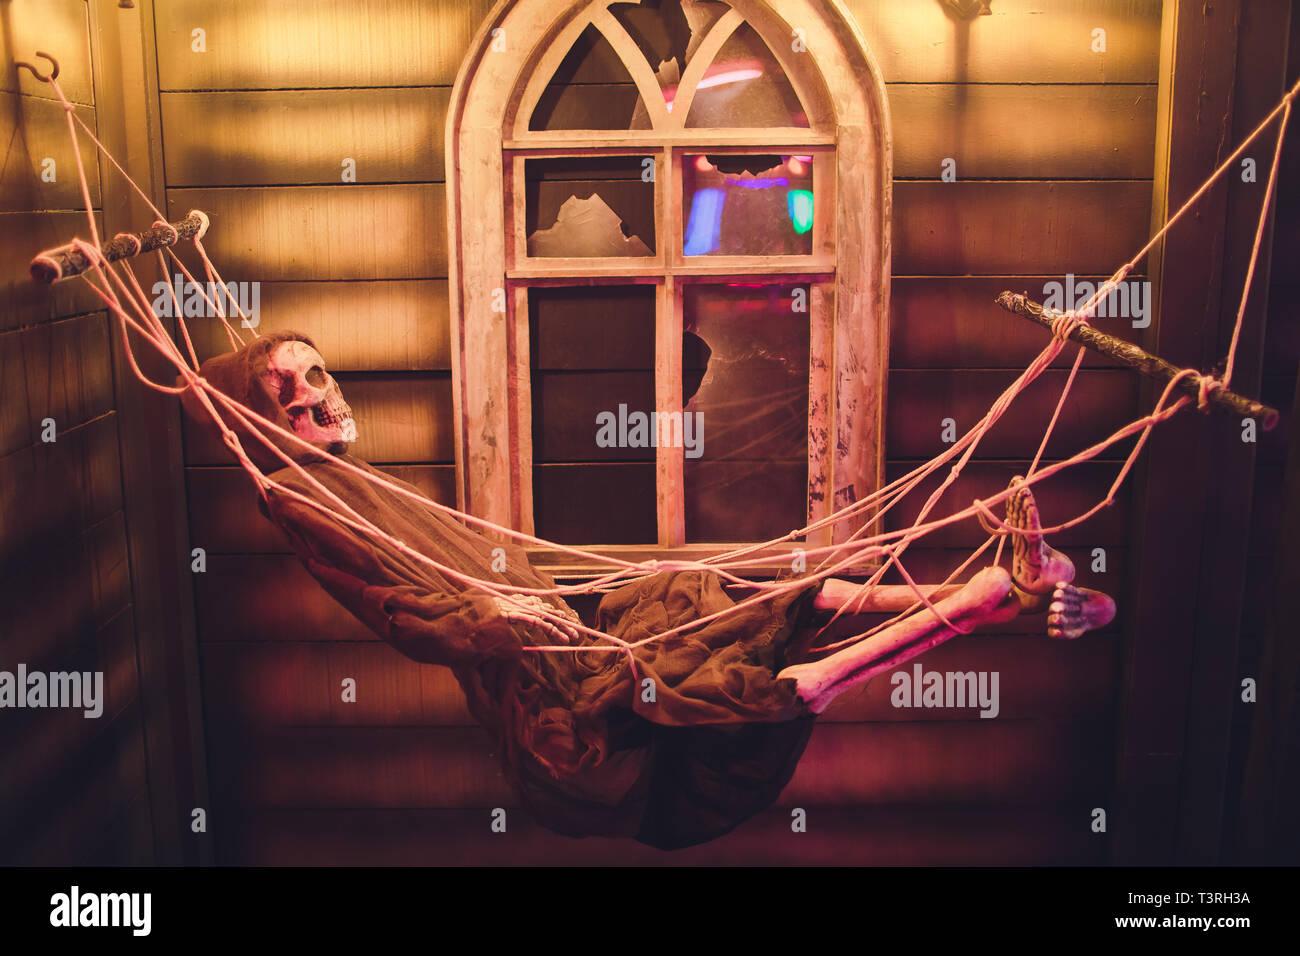 Human skeleton swinging on hammock against the window of the house. - Stock Image